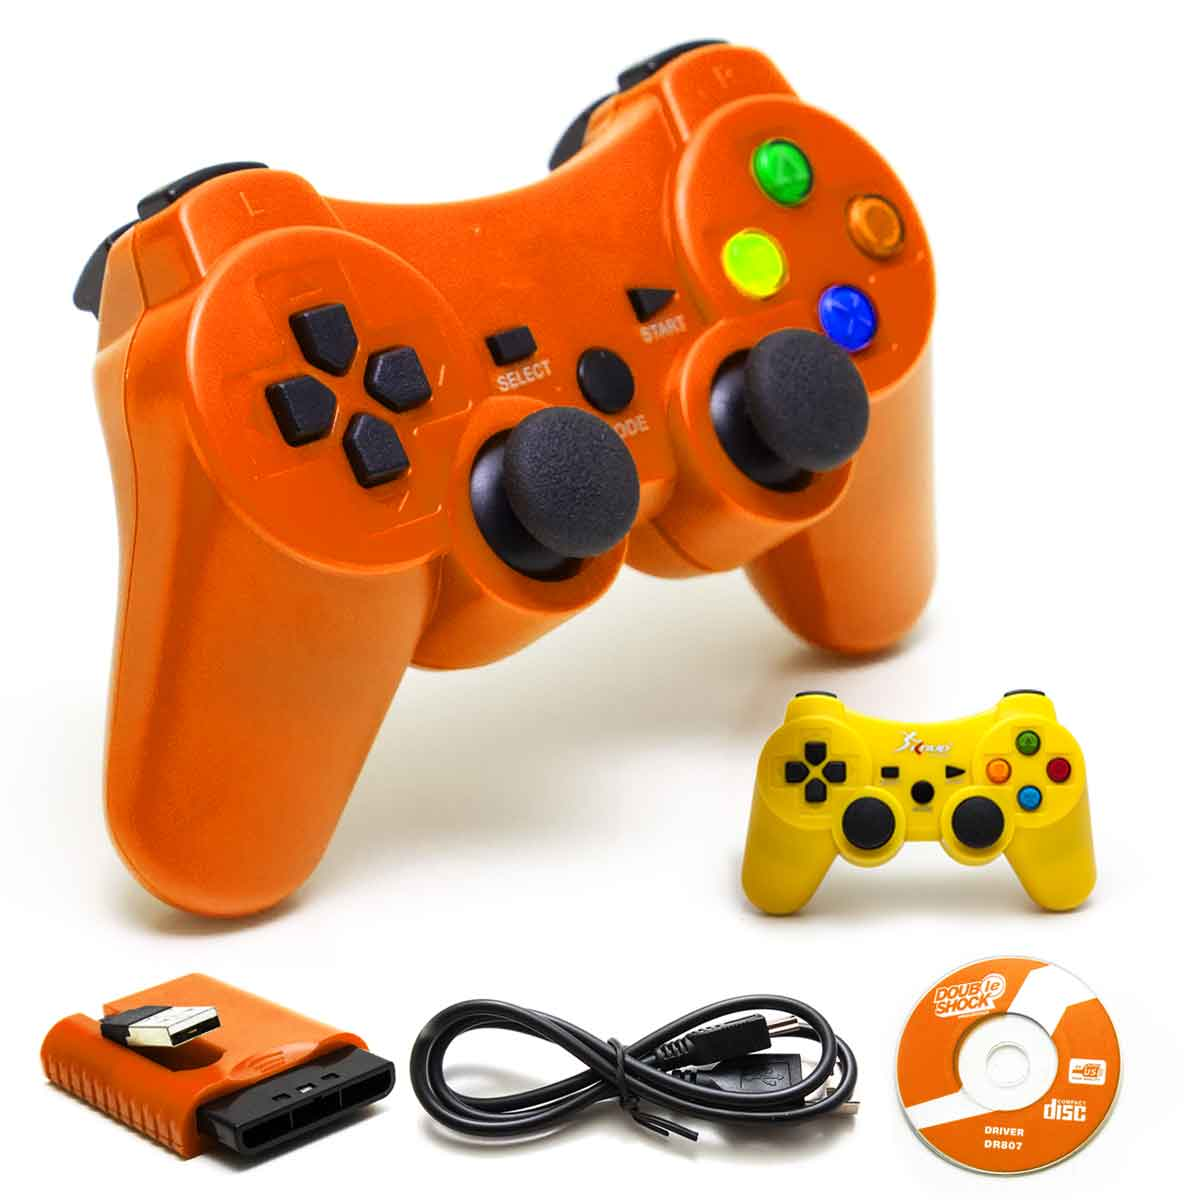 Controle Sem Fio 4 Em 1 Wireless Recarregavel Pc Ps1 Ps2 Ps3